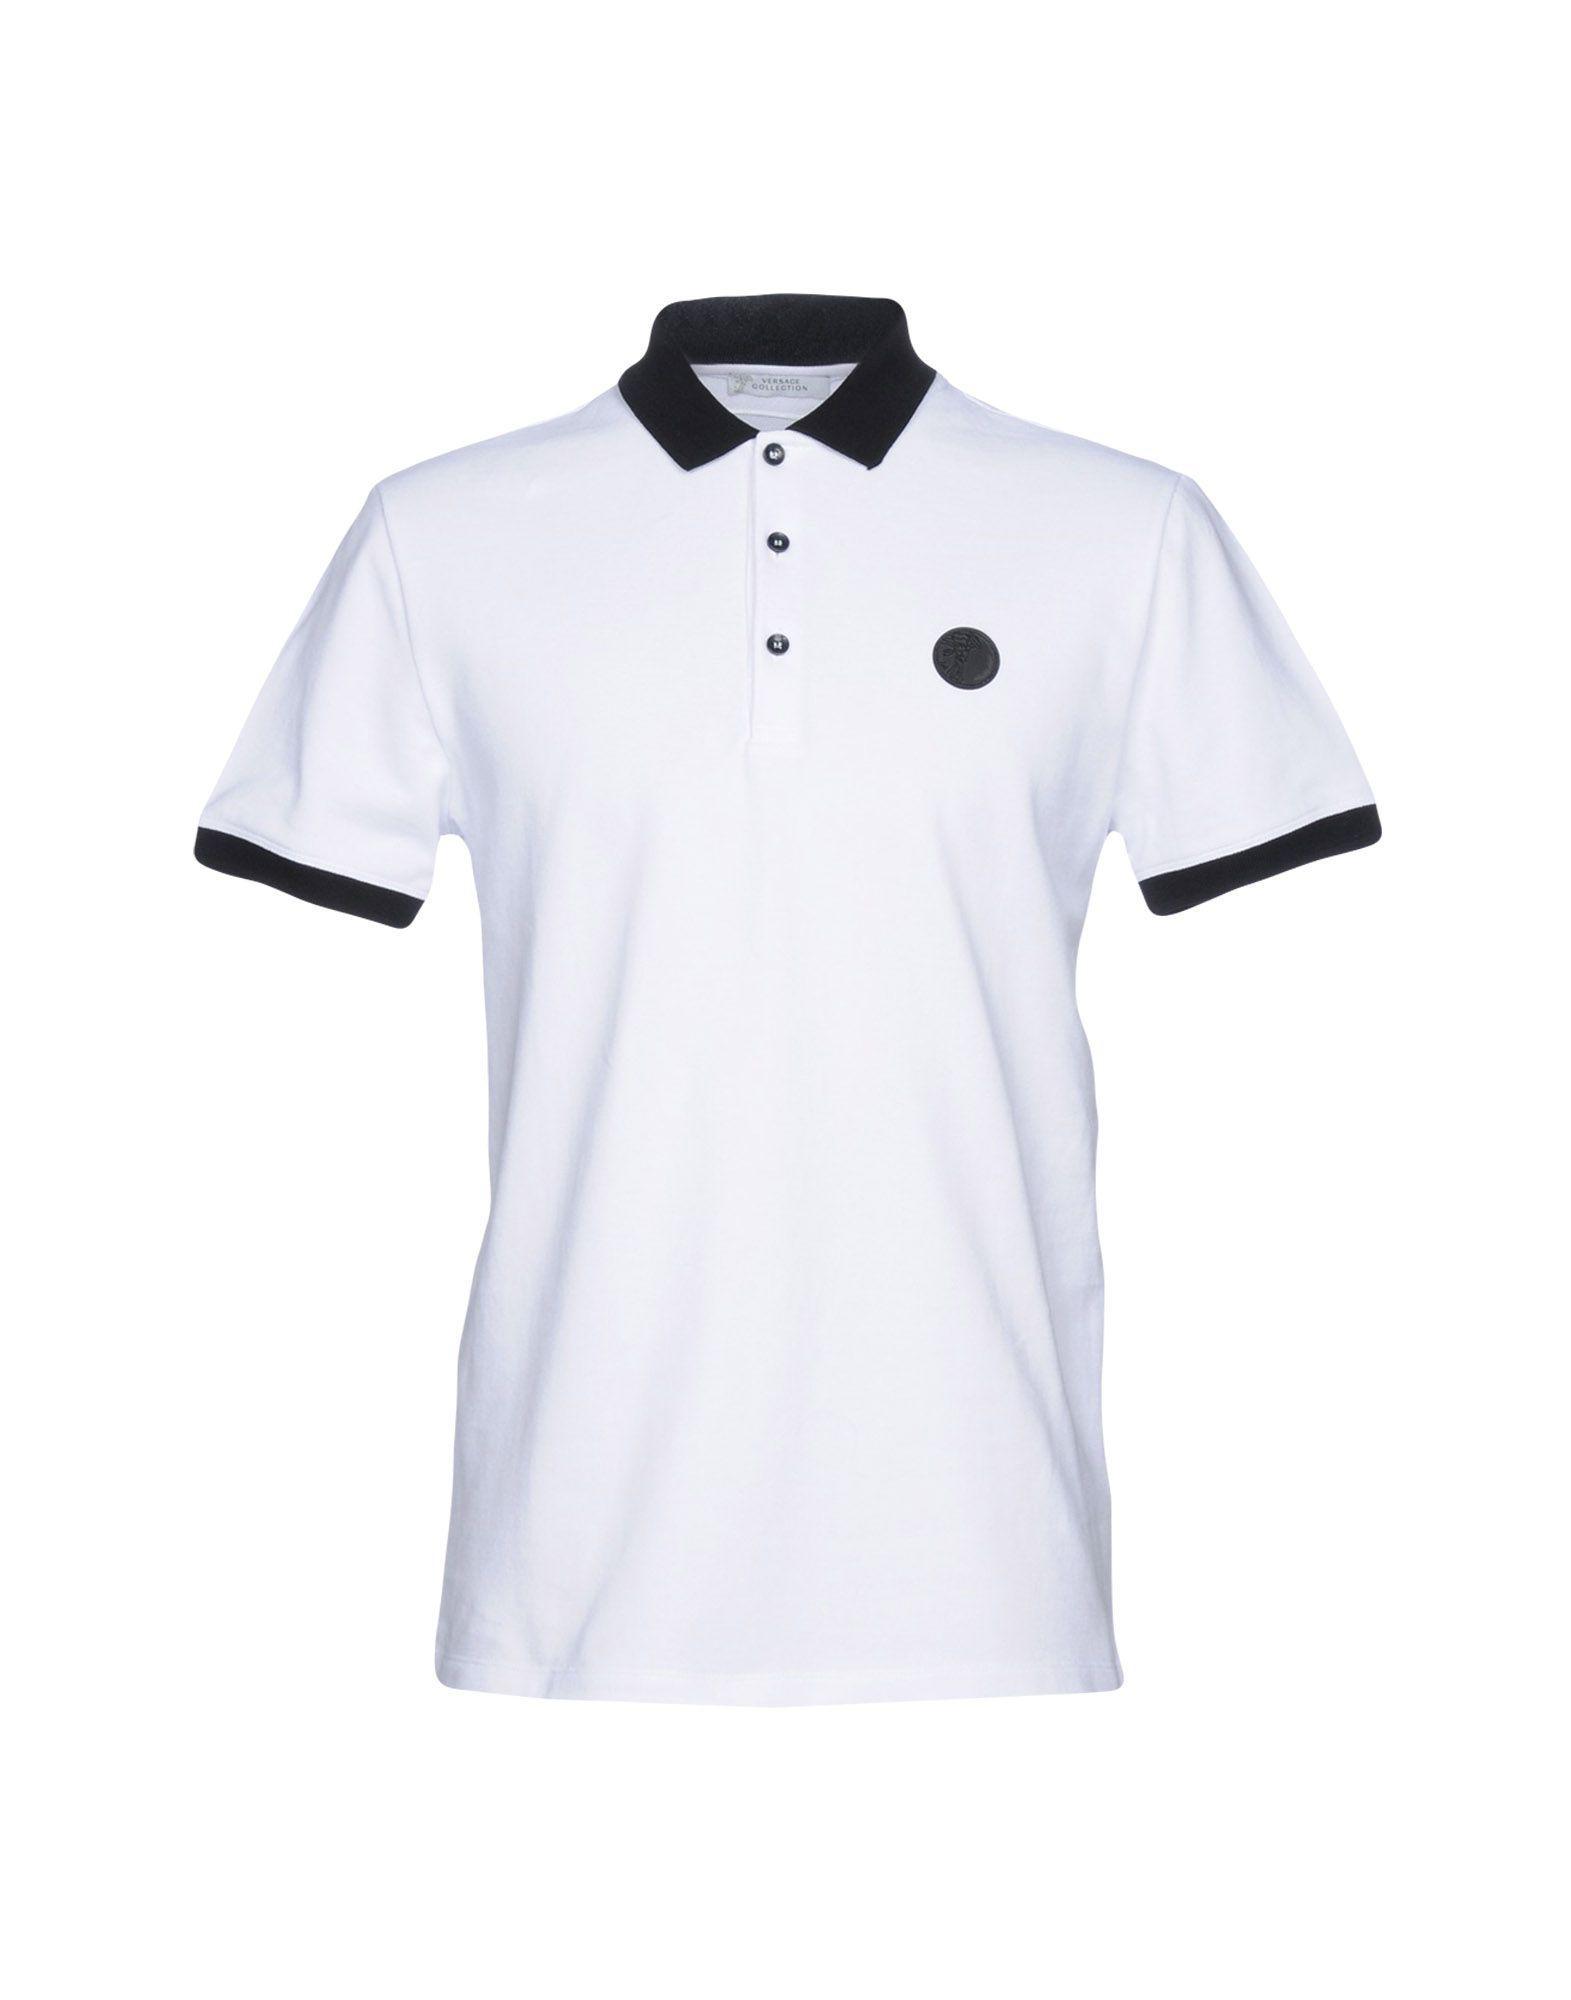 fe118d4d Versace Polo Shirt in White for Men - Lyst